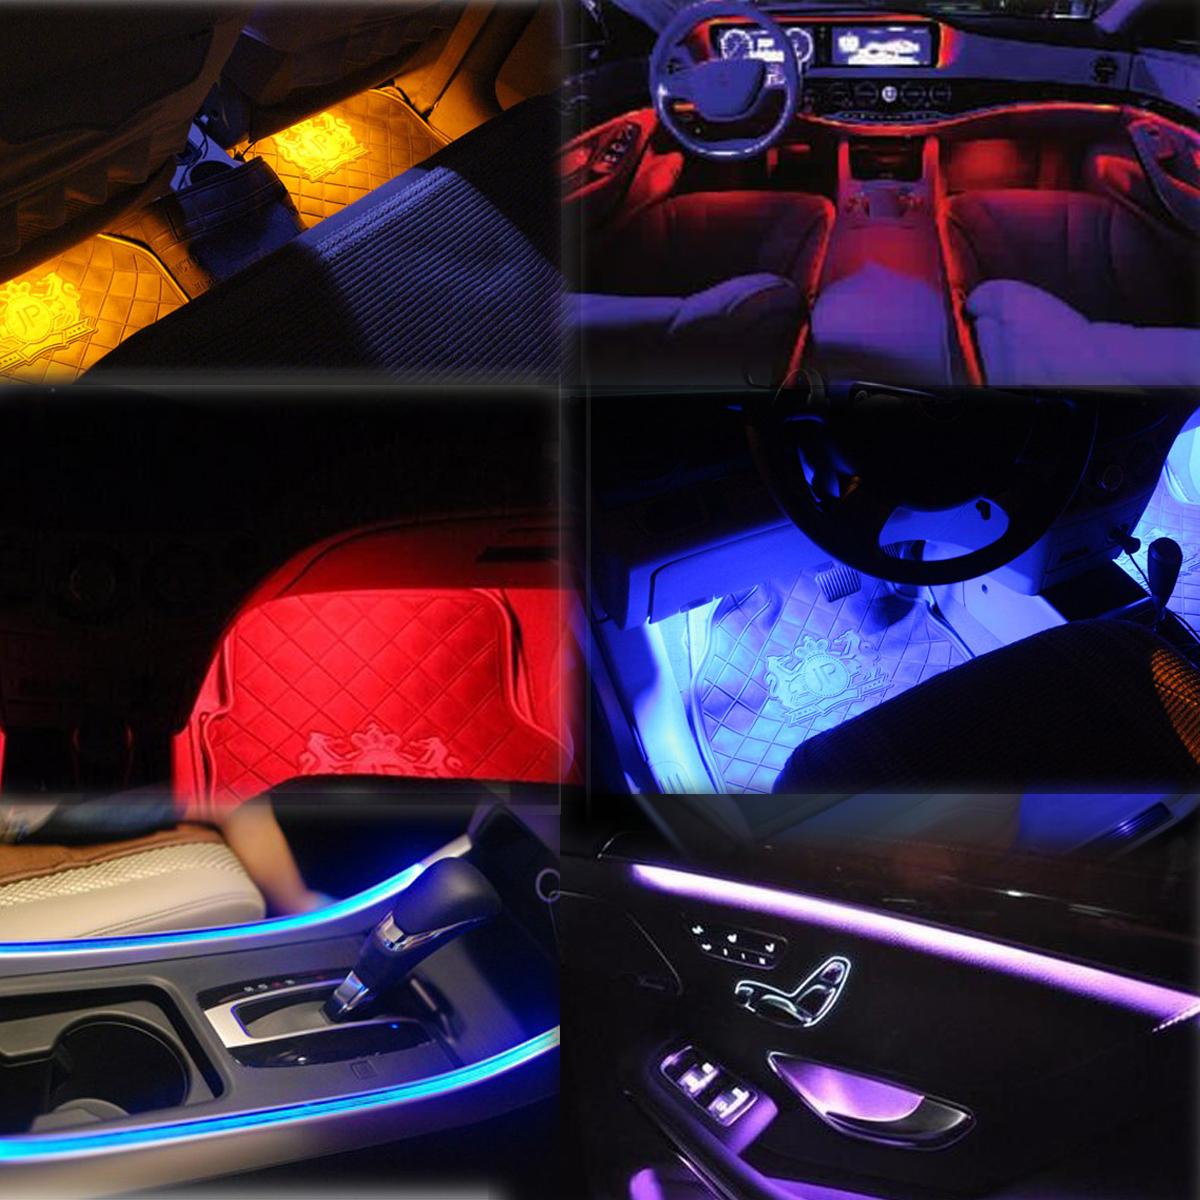 wow 12v car interior decor rgb led strip light 7 colors wireless music control ebay. Black Bedroom Furniture Sets. Home Design Ideas